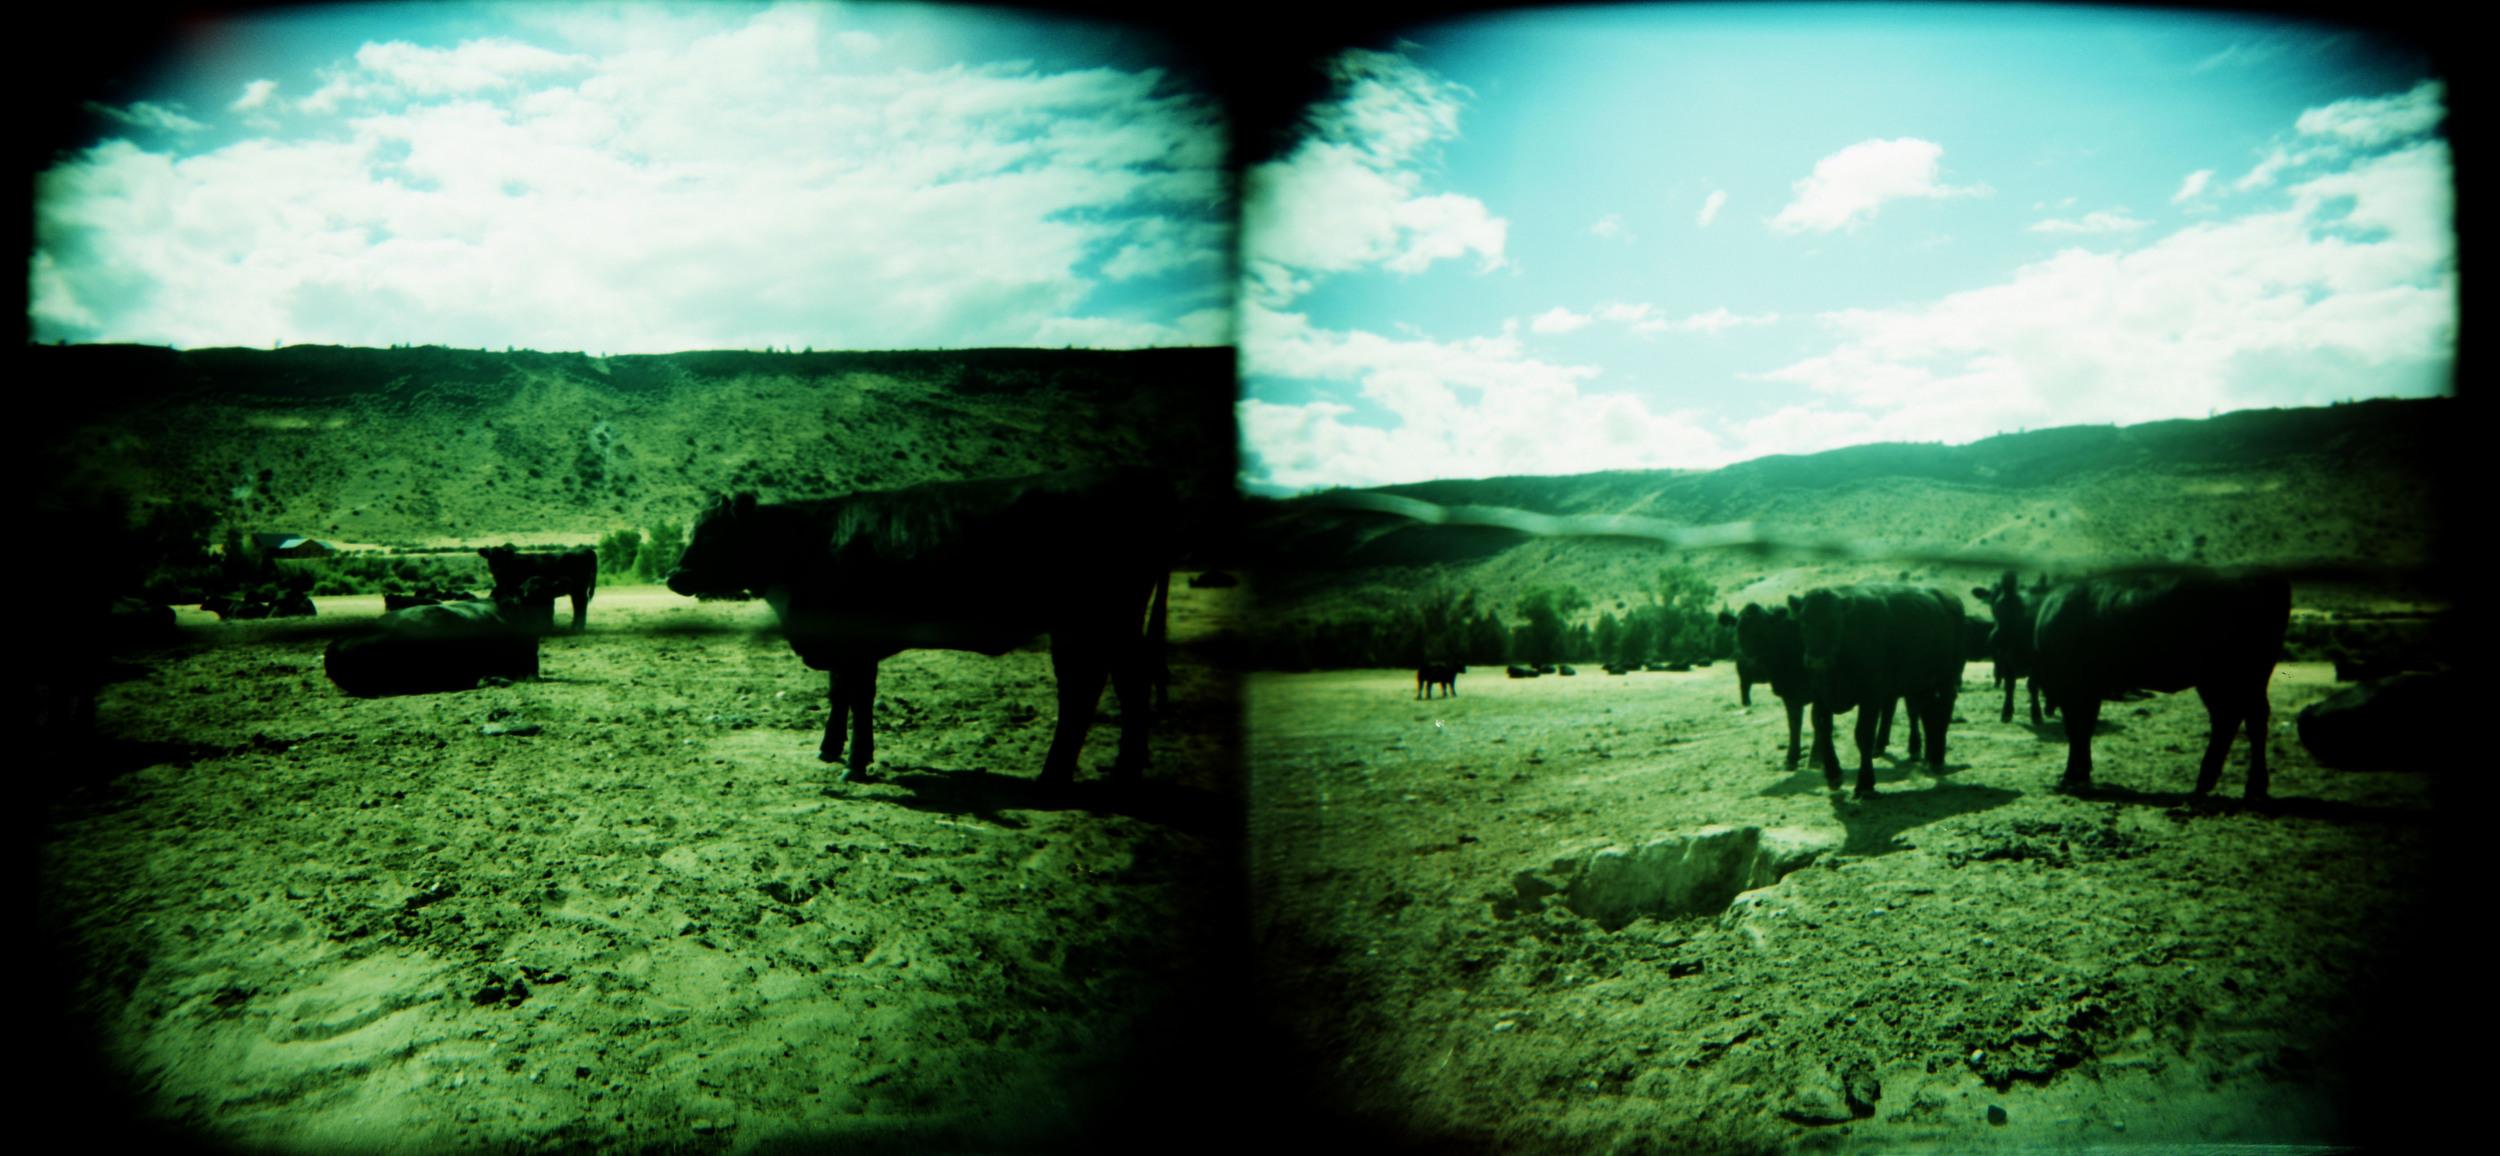 cows 6.jpg